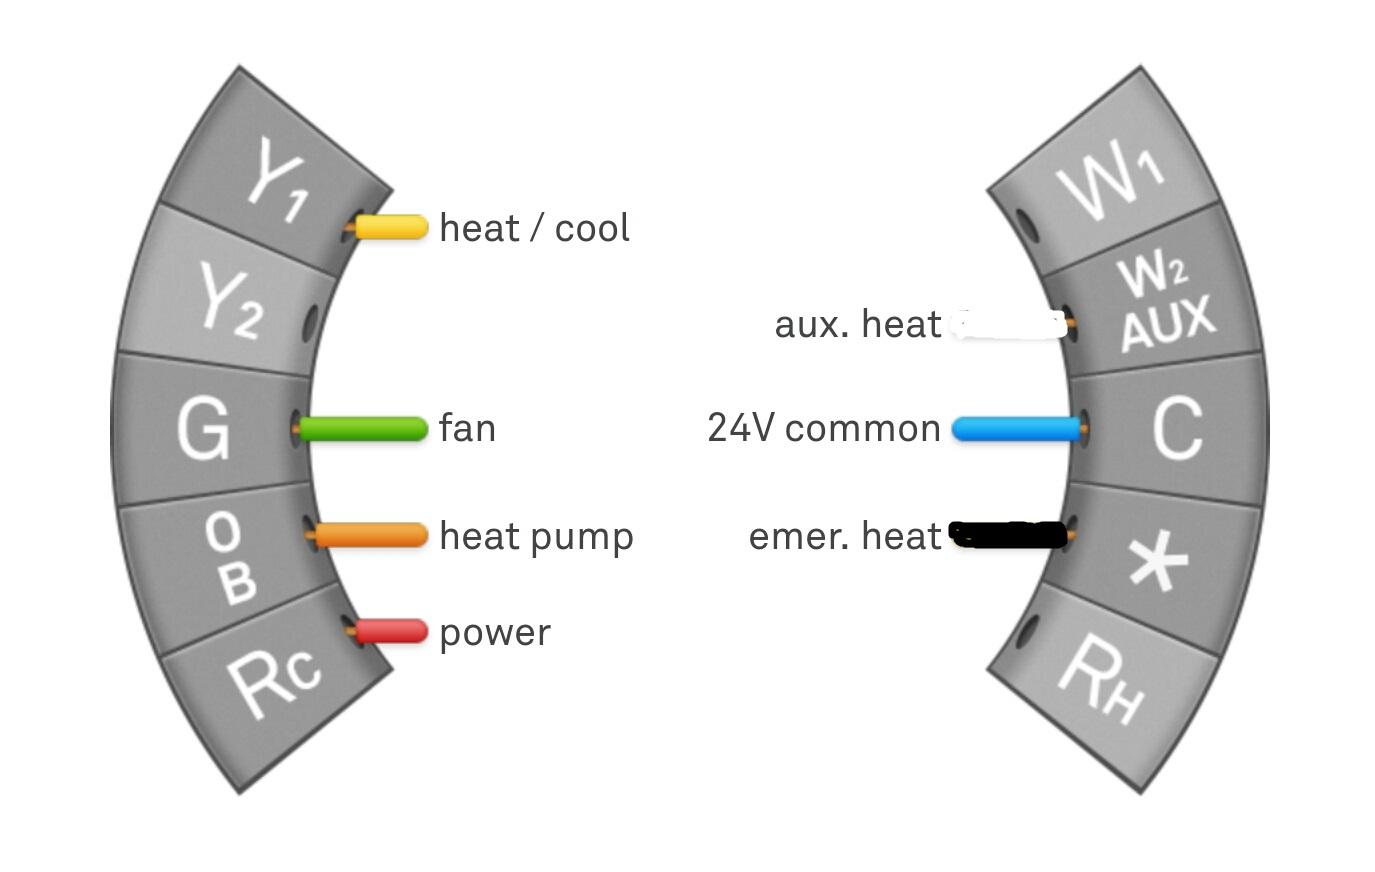 hight resolution of nest radiant heat wiring diagram wiring diagram blog nest thermostat heat pump wiring diagram heat pump